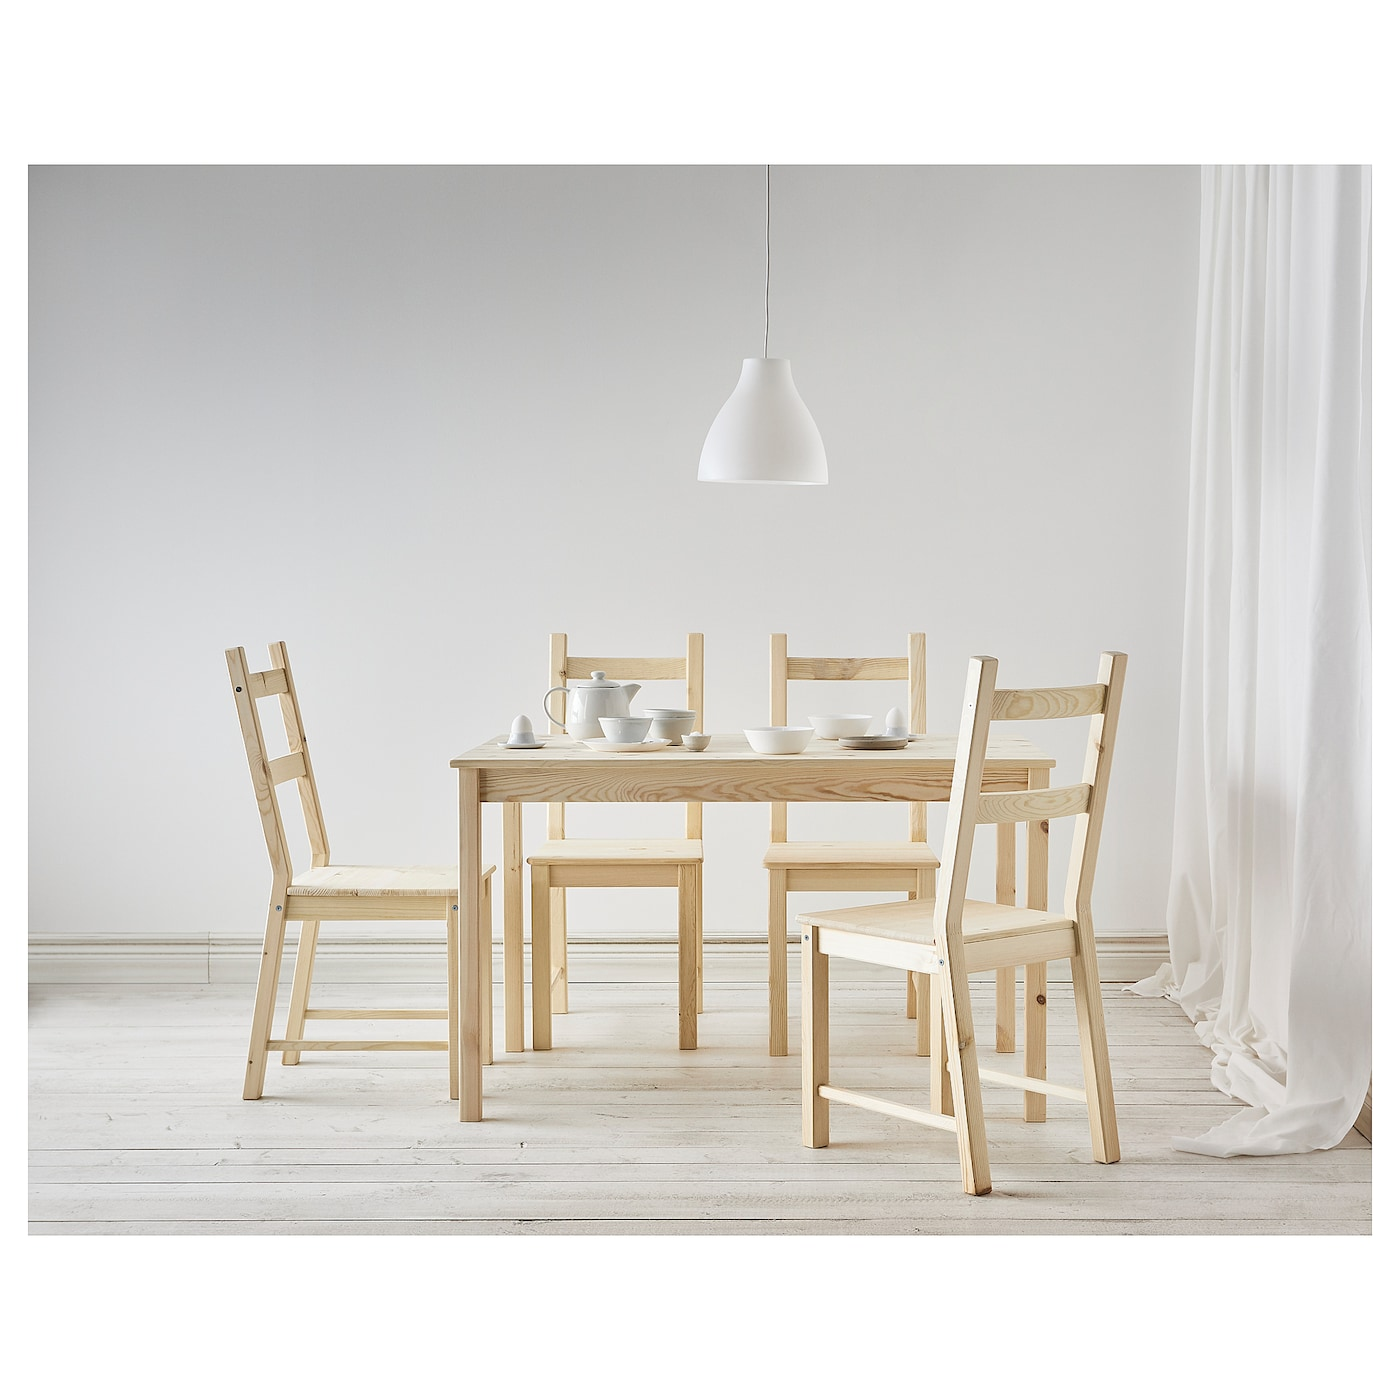 Ikea Ivar Chair